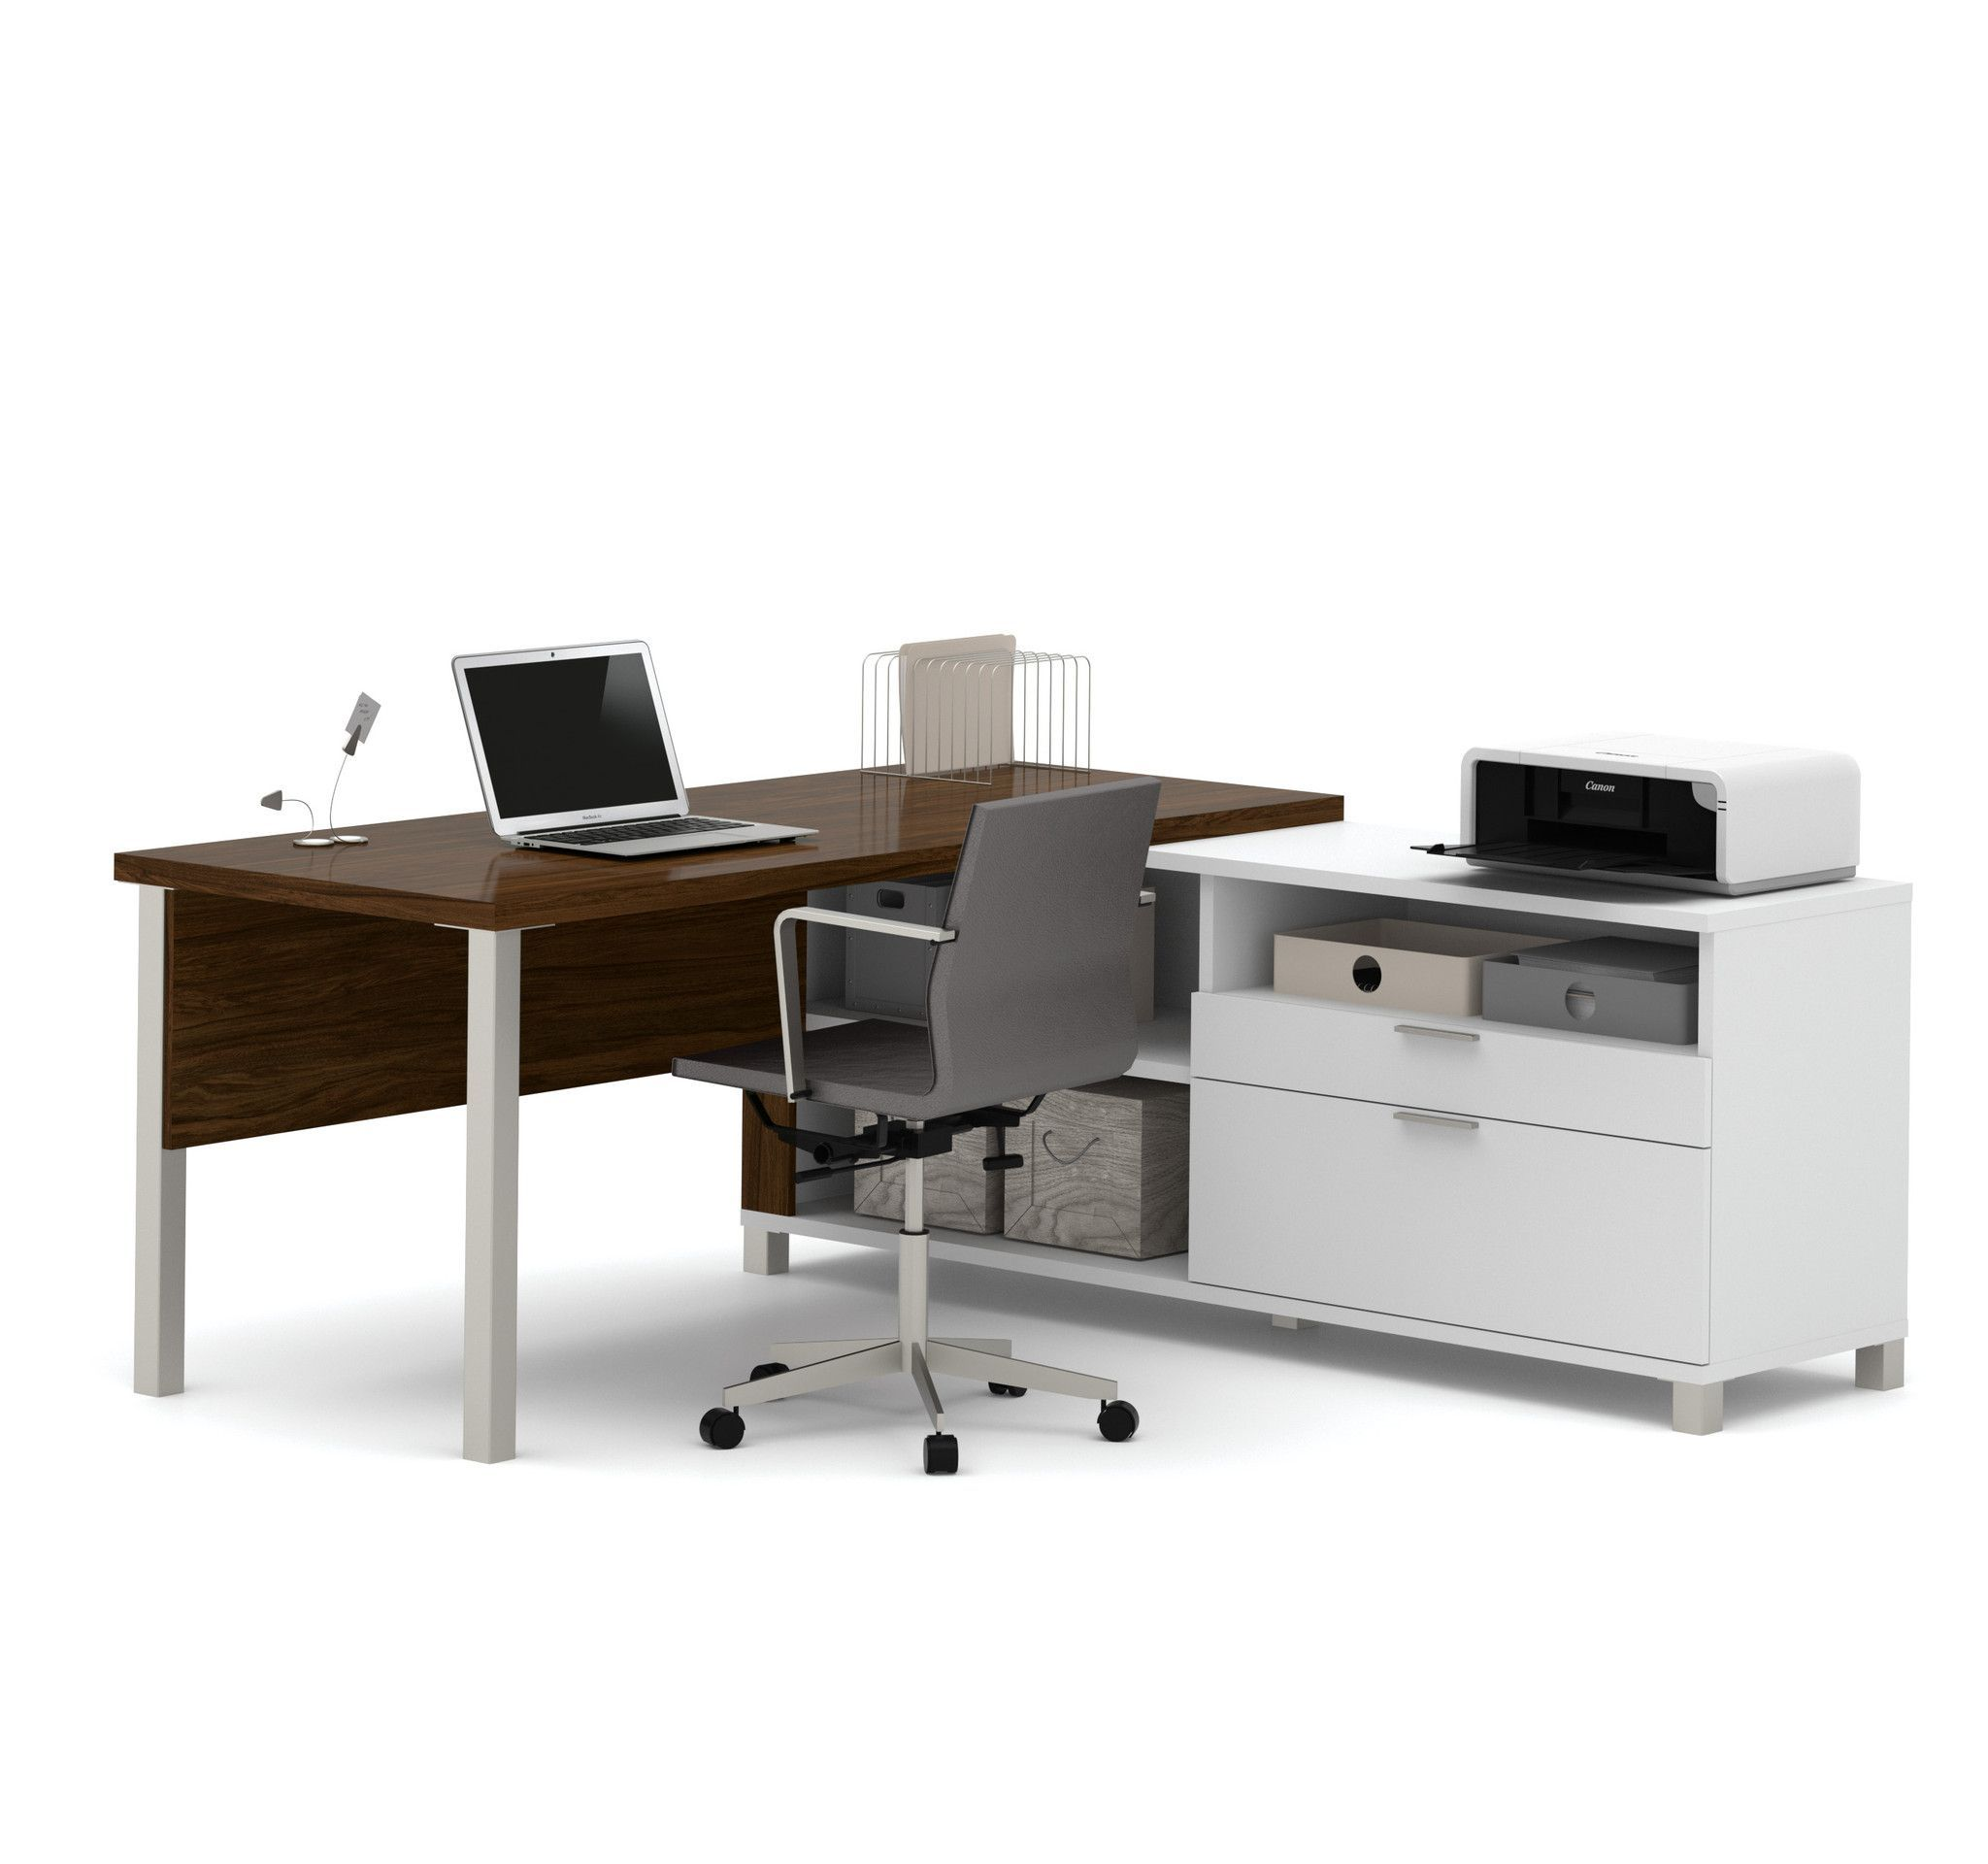 Premium Modern L-shaped Desk in Oak Barrel & White | Barrels, Desks ...